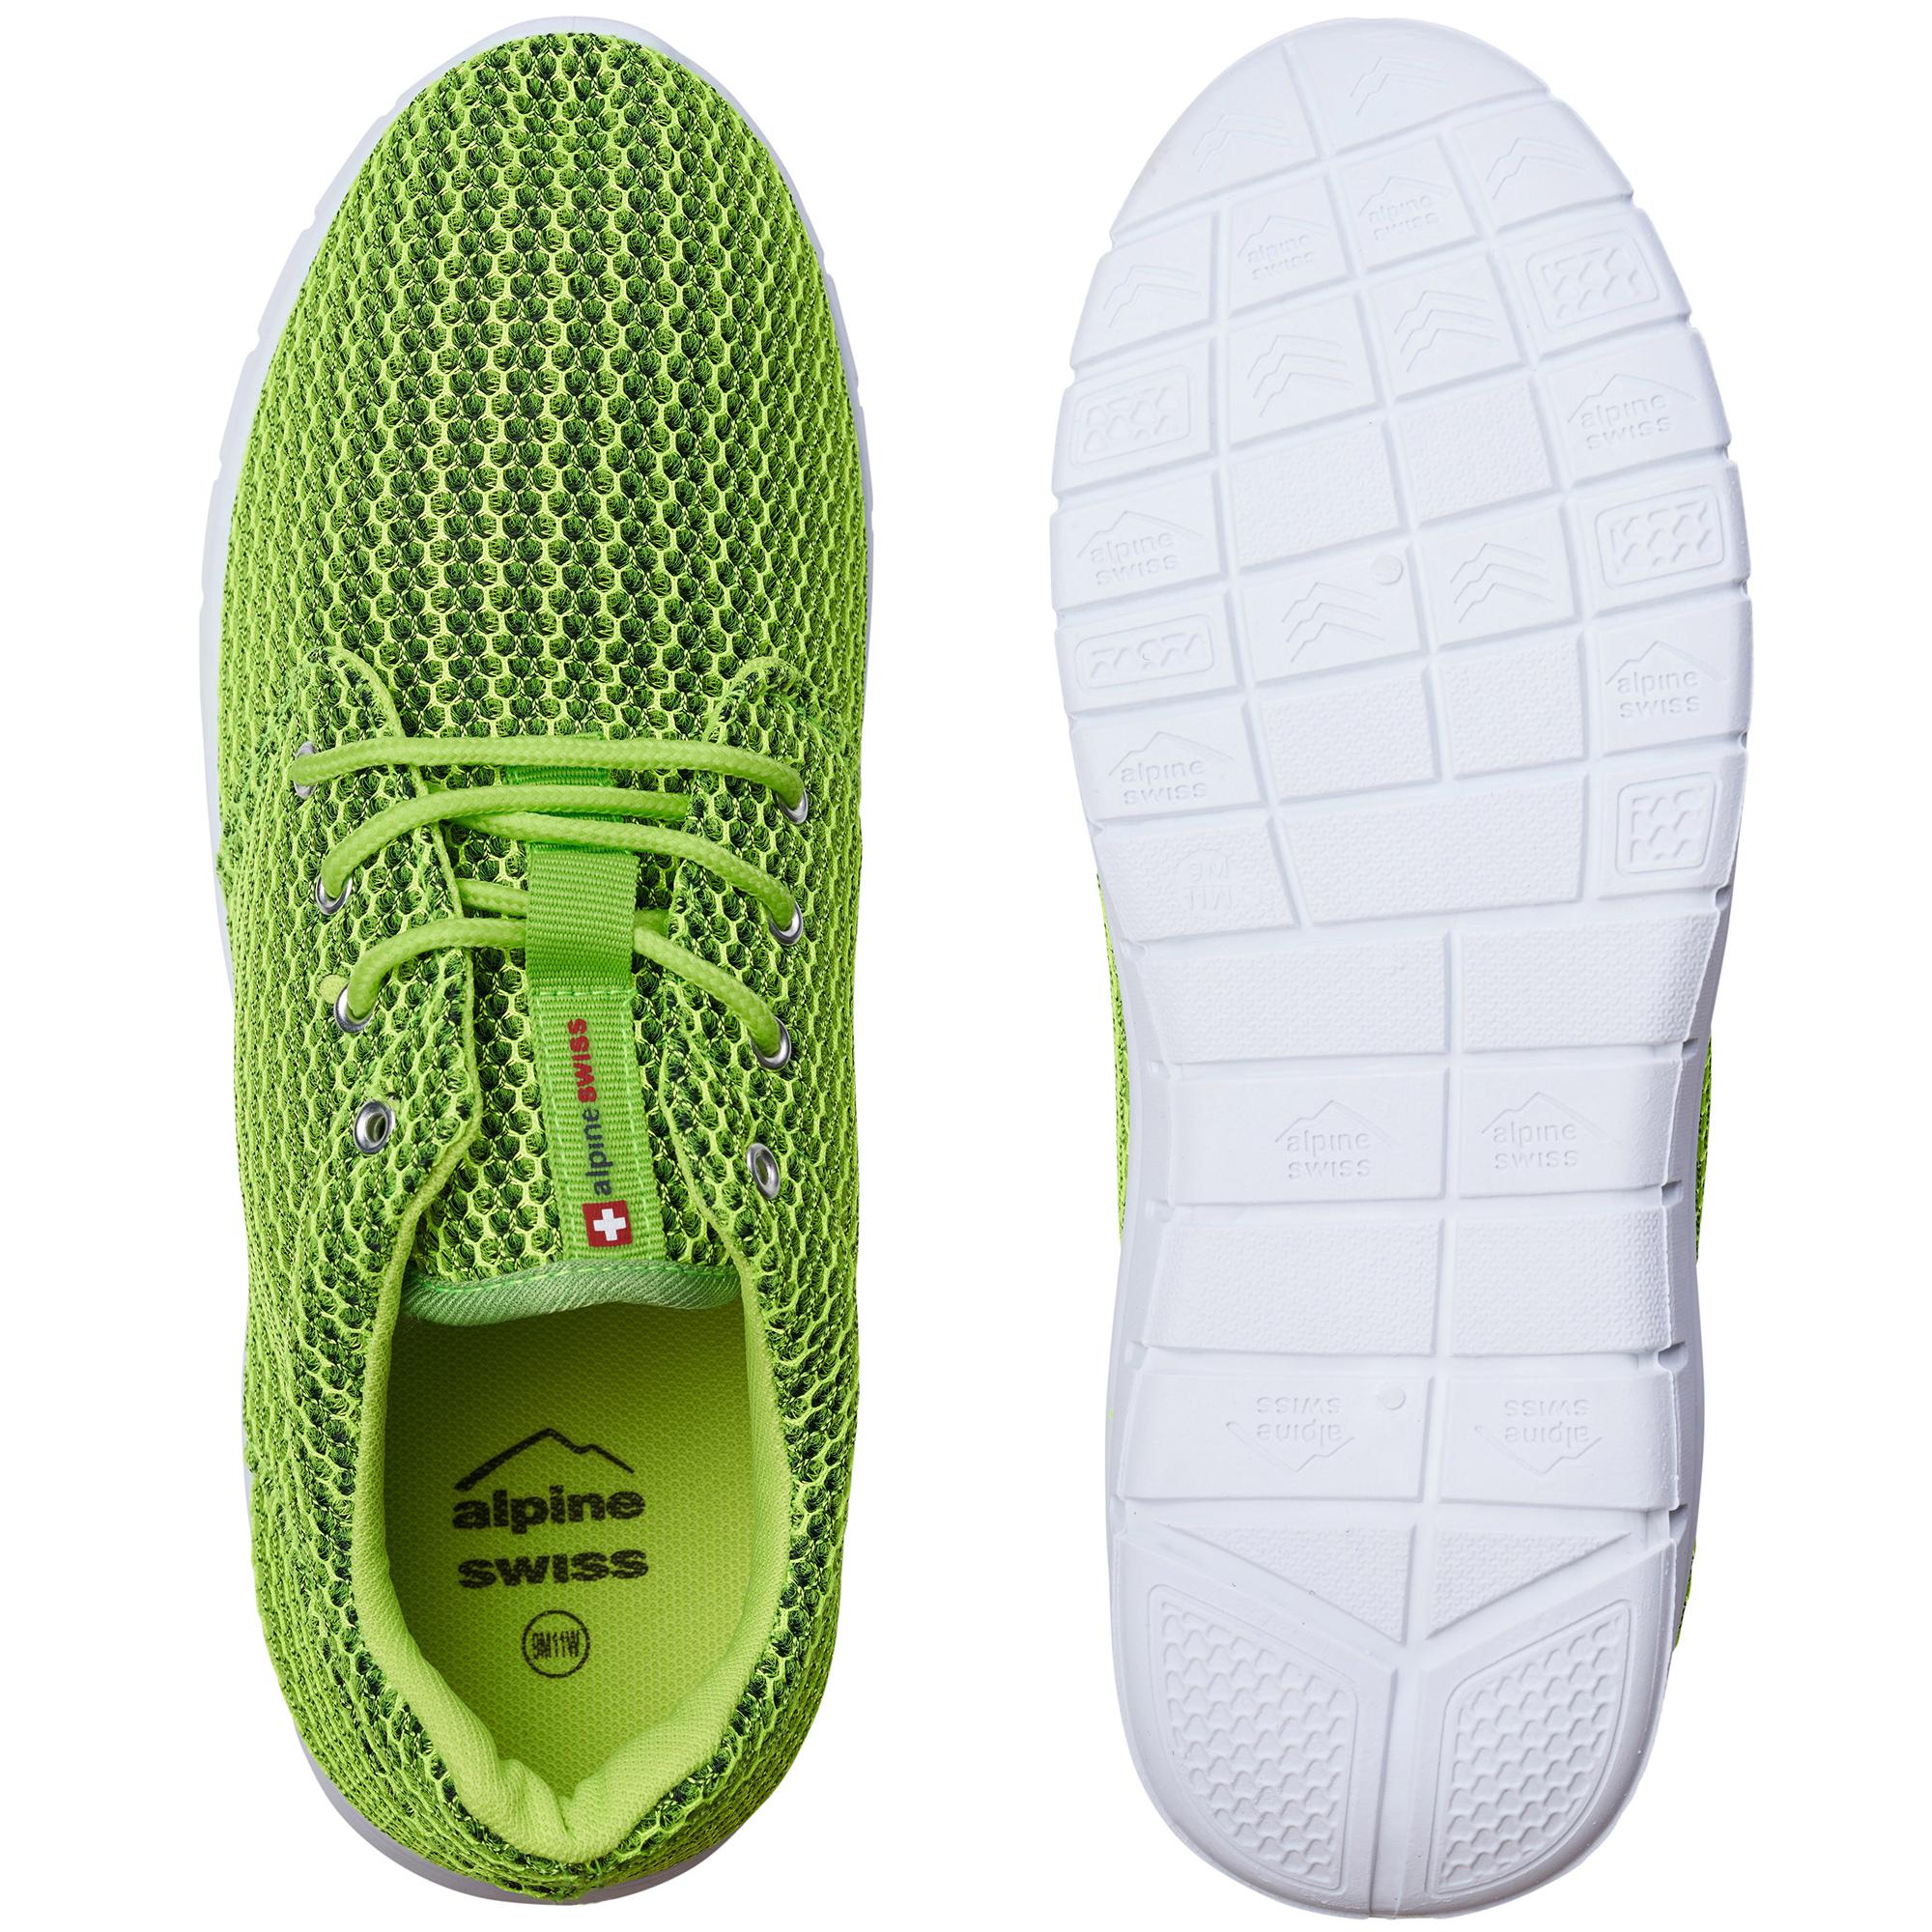 Alpine Swiss Kilian Mesh Sneakers Casual Shoes Mens & Womens Lightweight Trainer